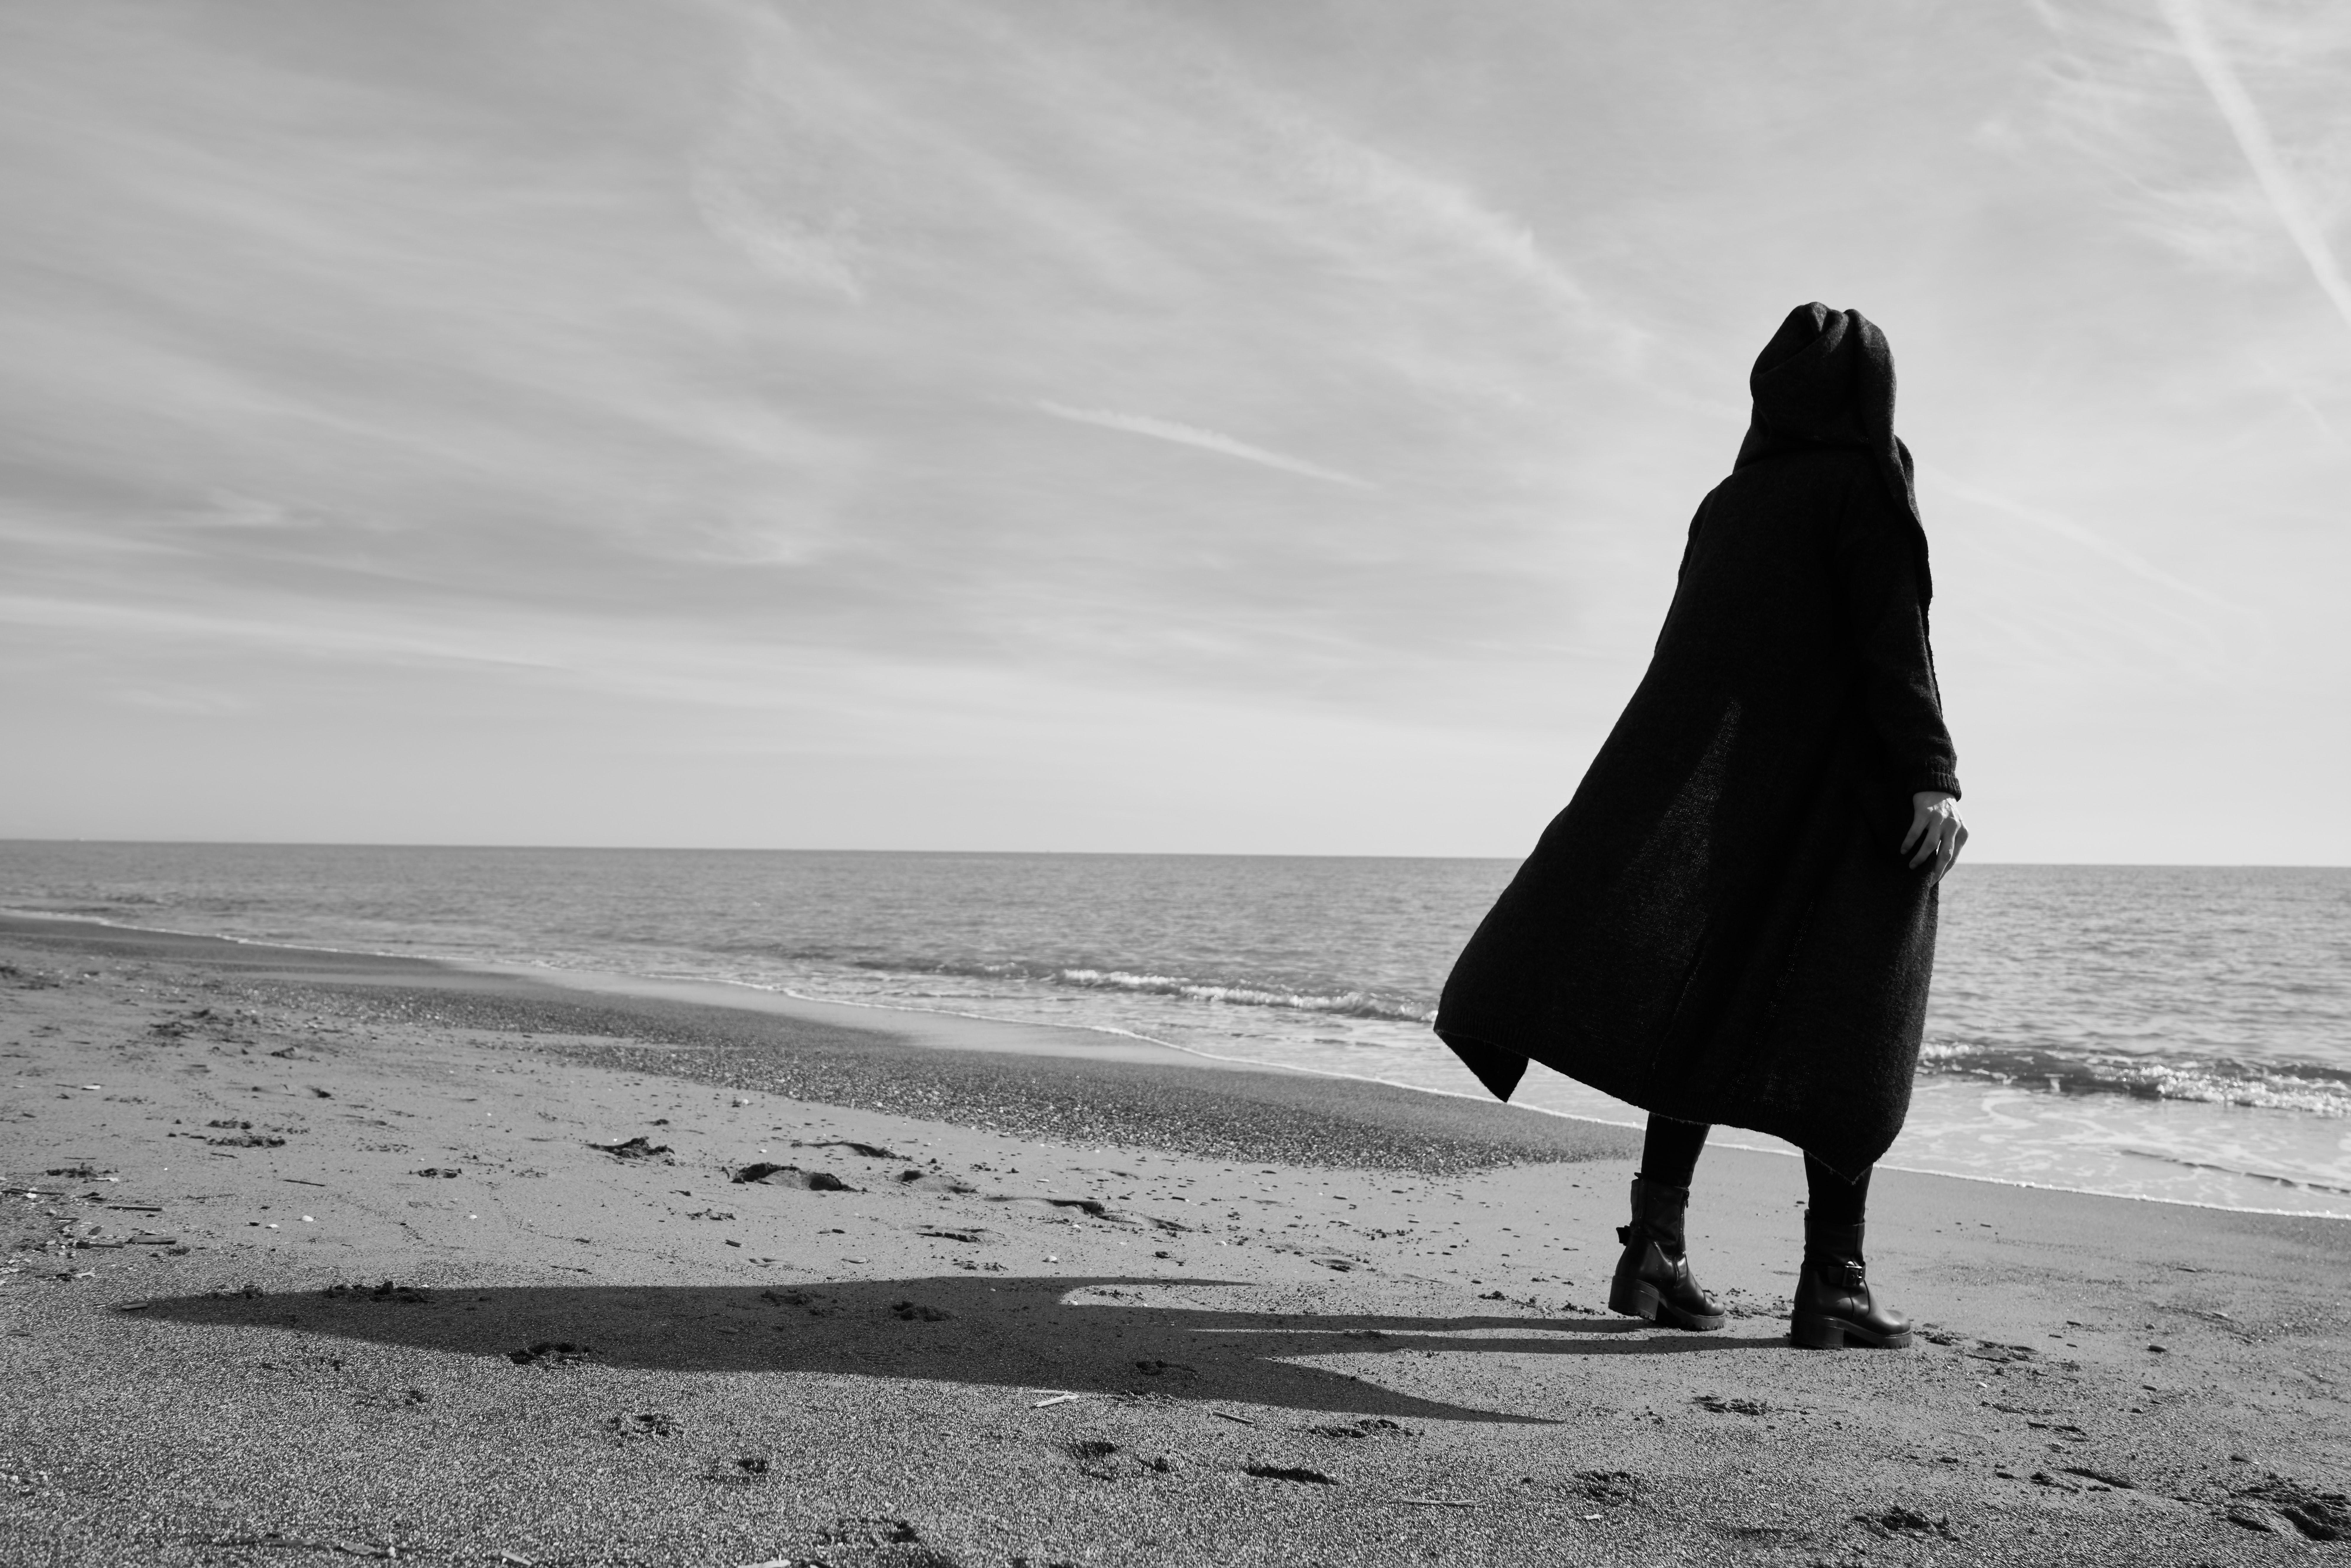 art-beach-black-and-white-2174623